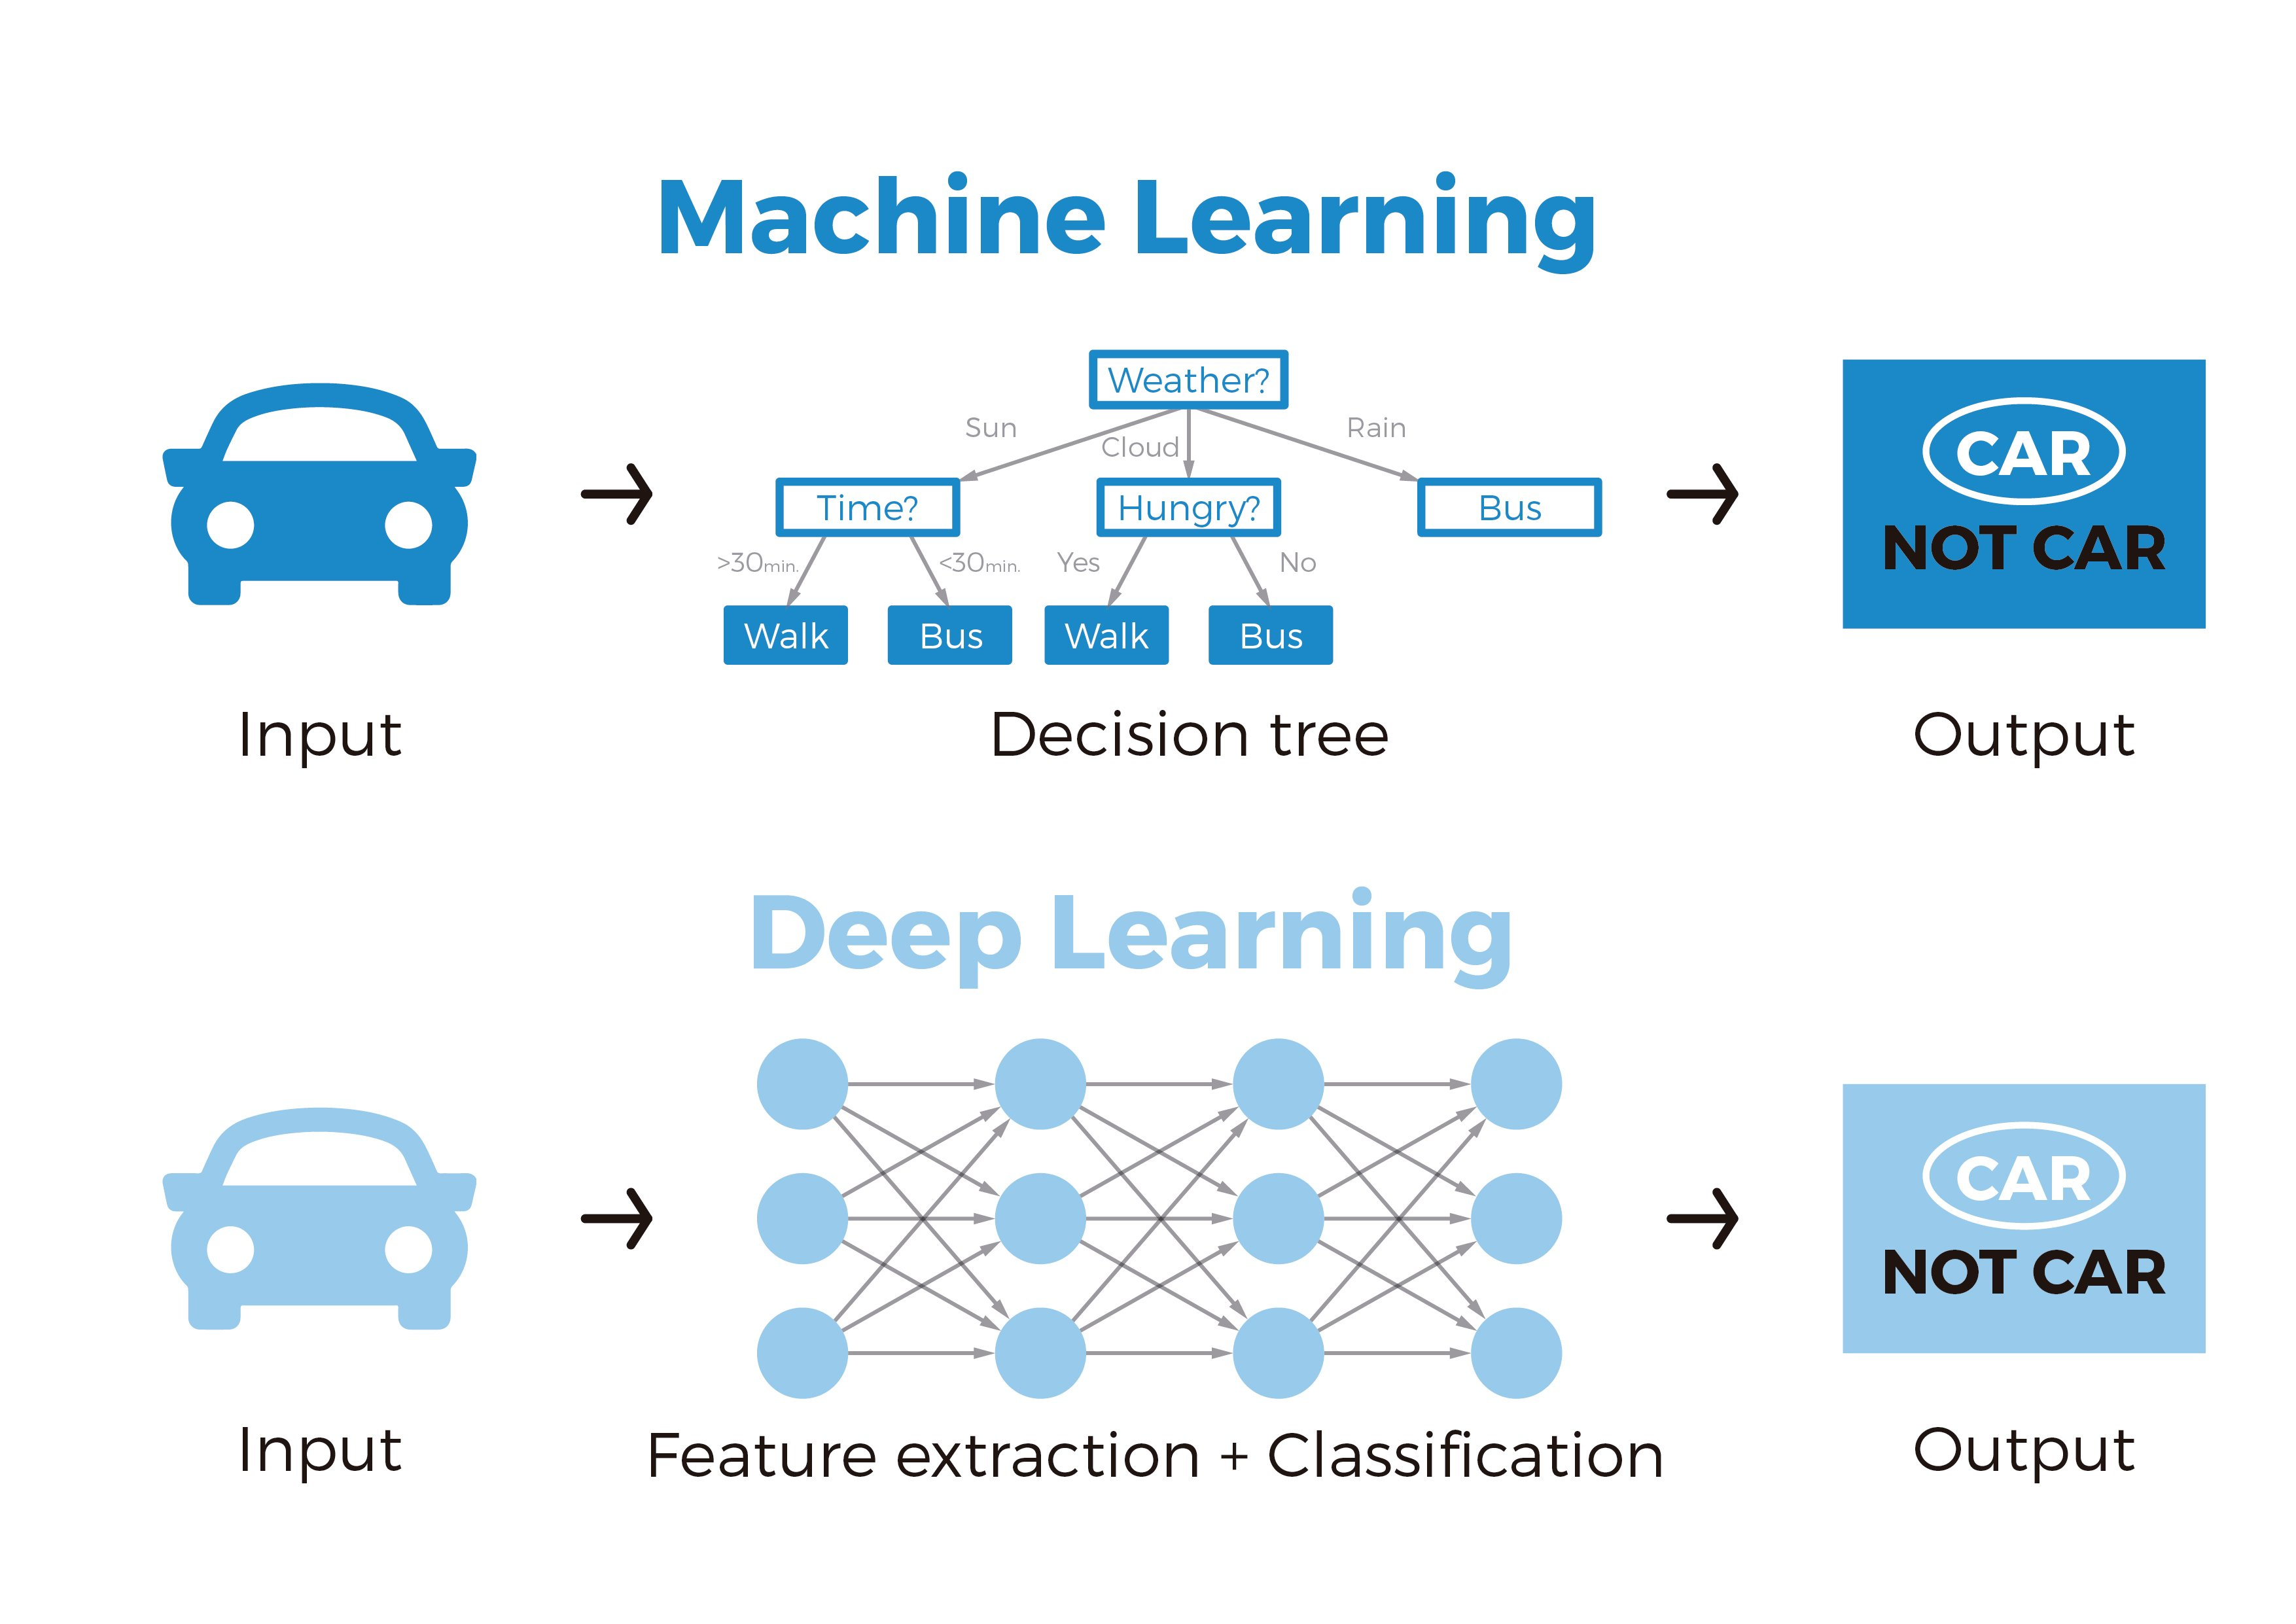 02-MachinelearningVSDeeplearning_Mesa de trabajo 1 copia 2_Mesa de trabajo 1 copia 2